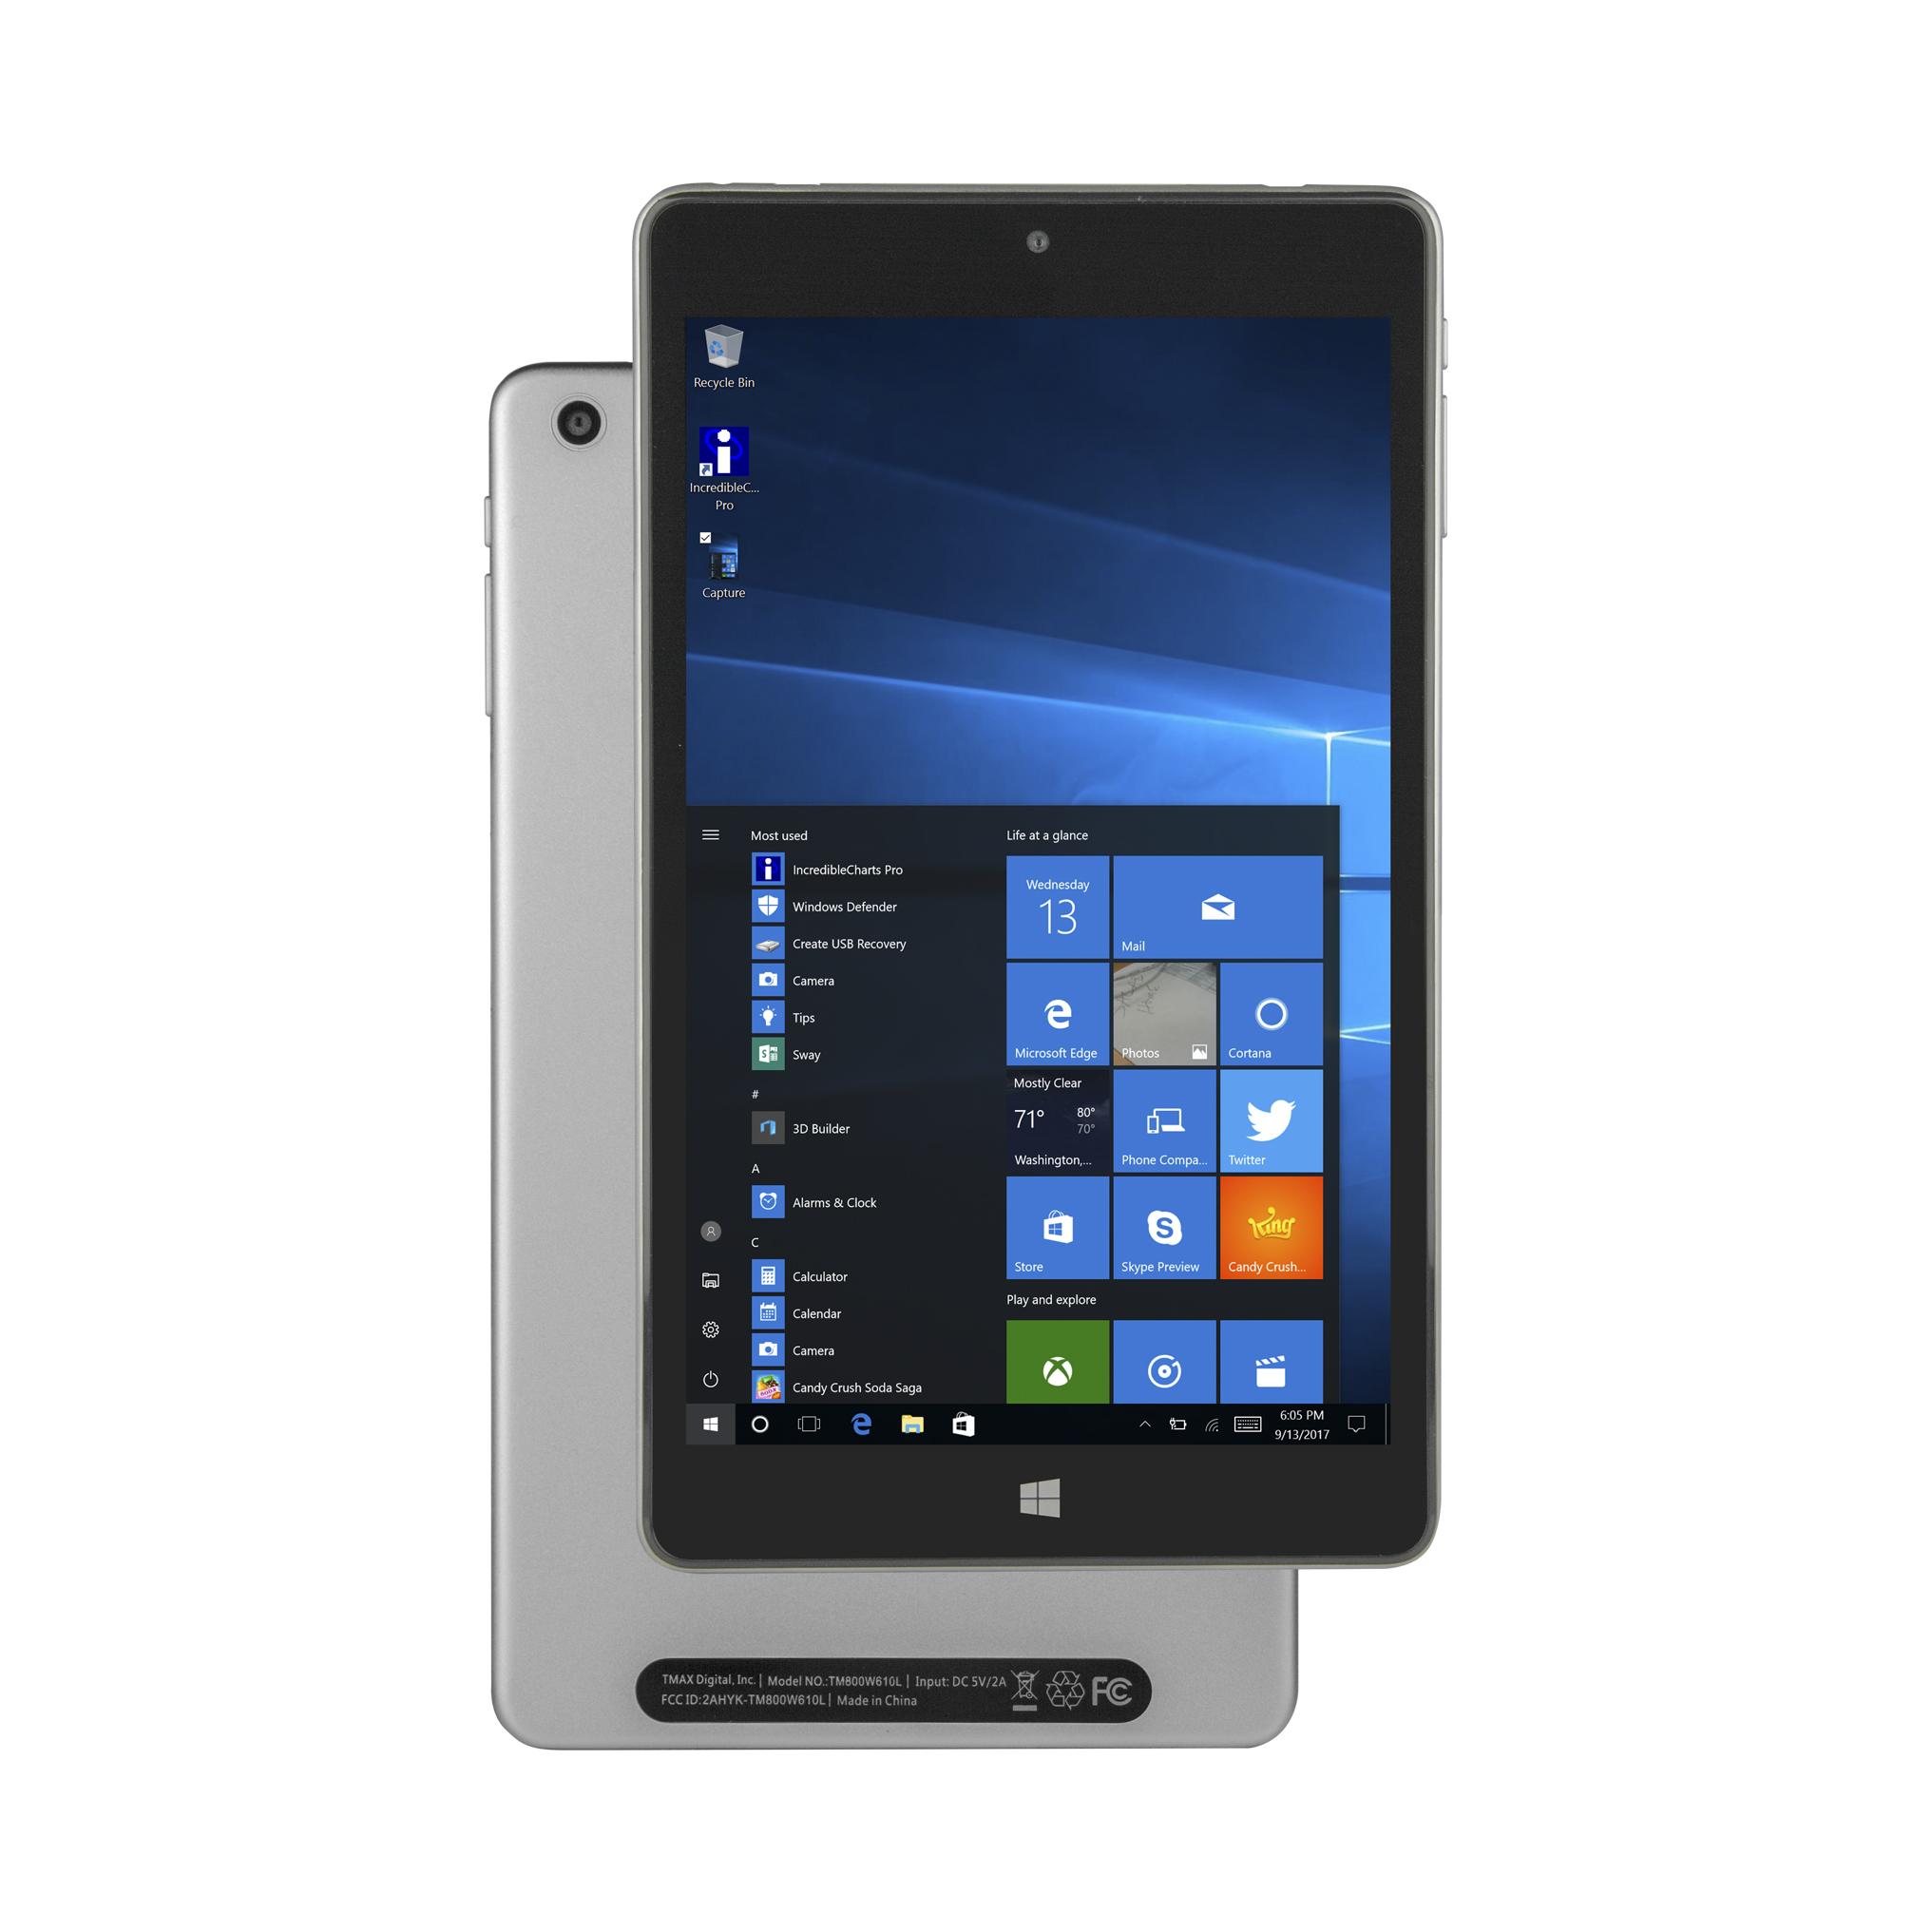 Solo 8 Windows Pro - Model Number: TM800P610L